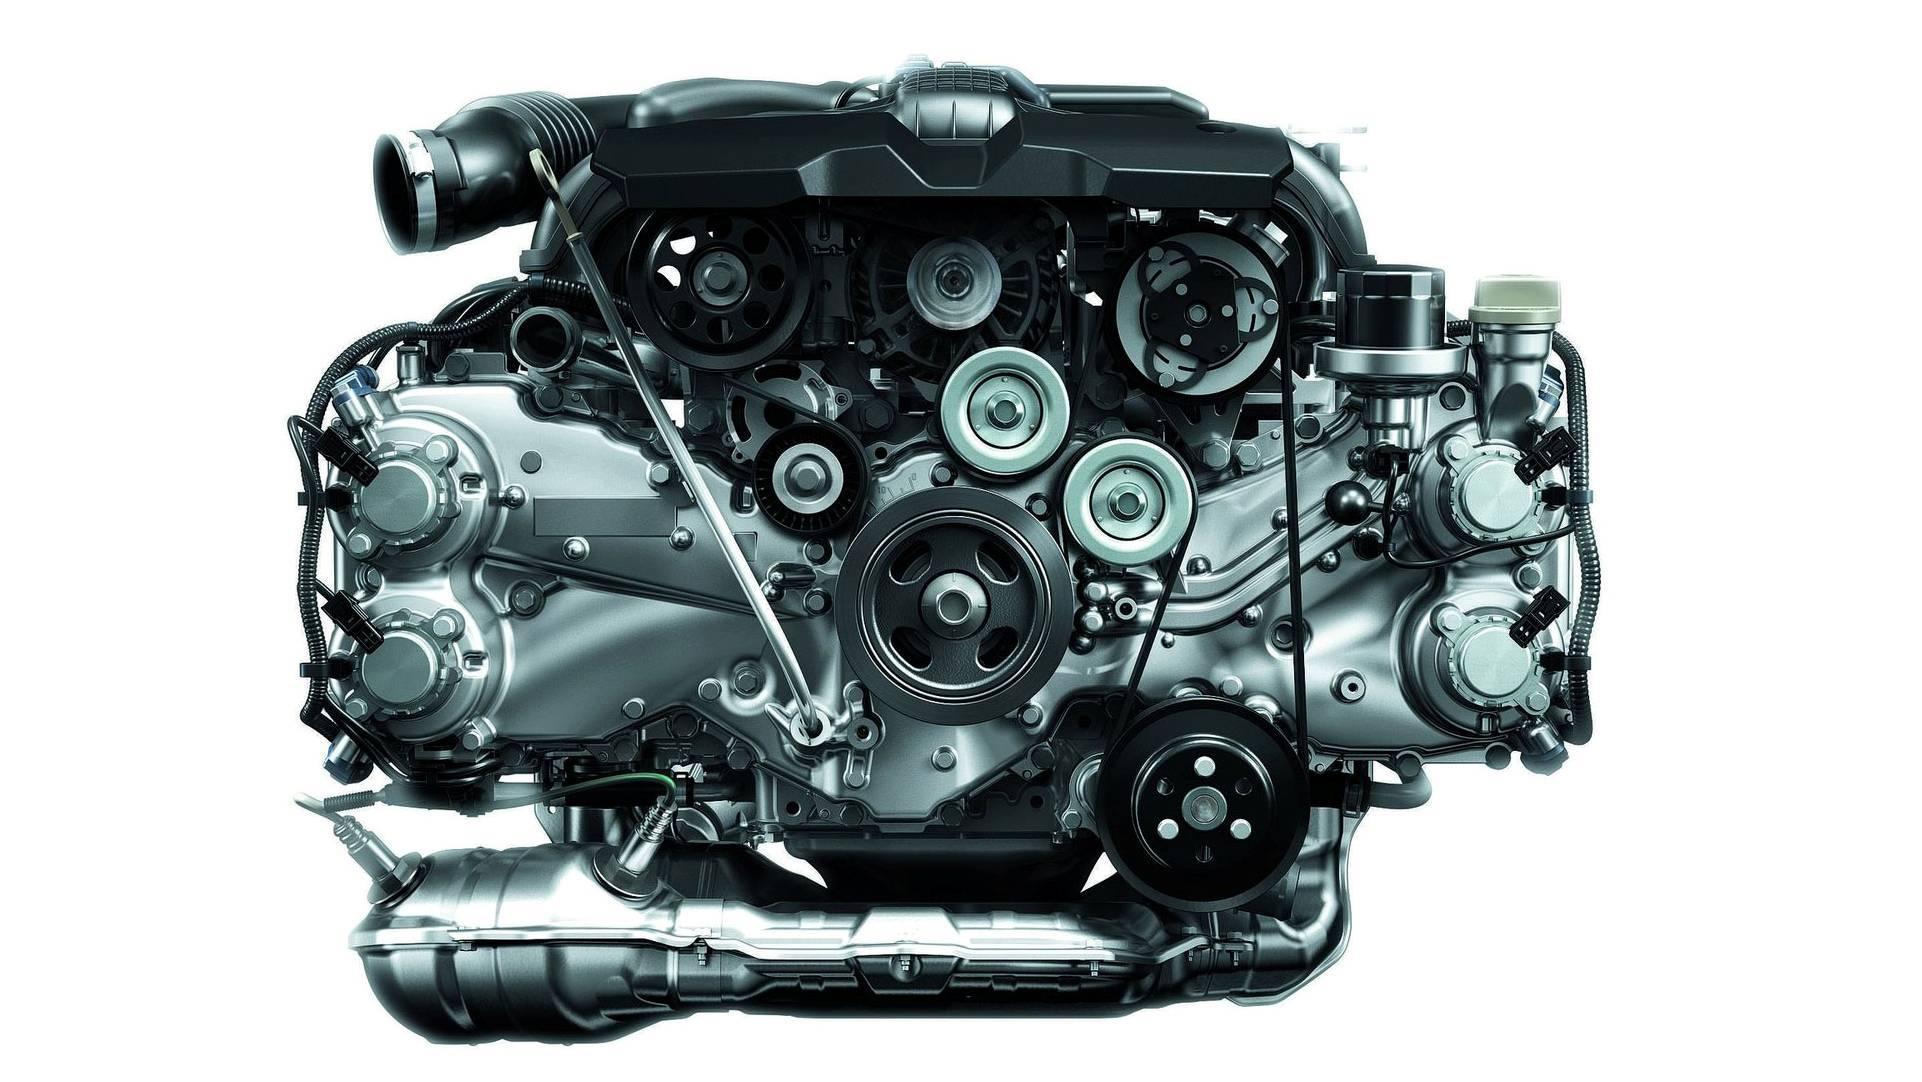 Motor Subaru Forester